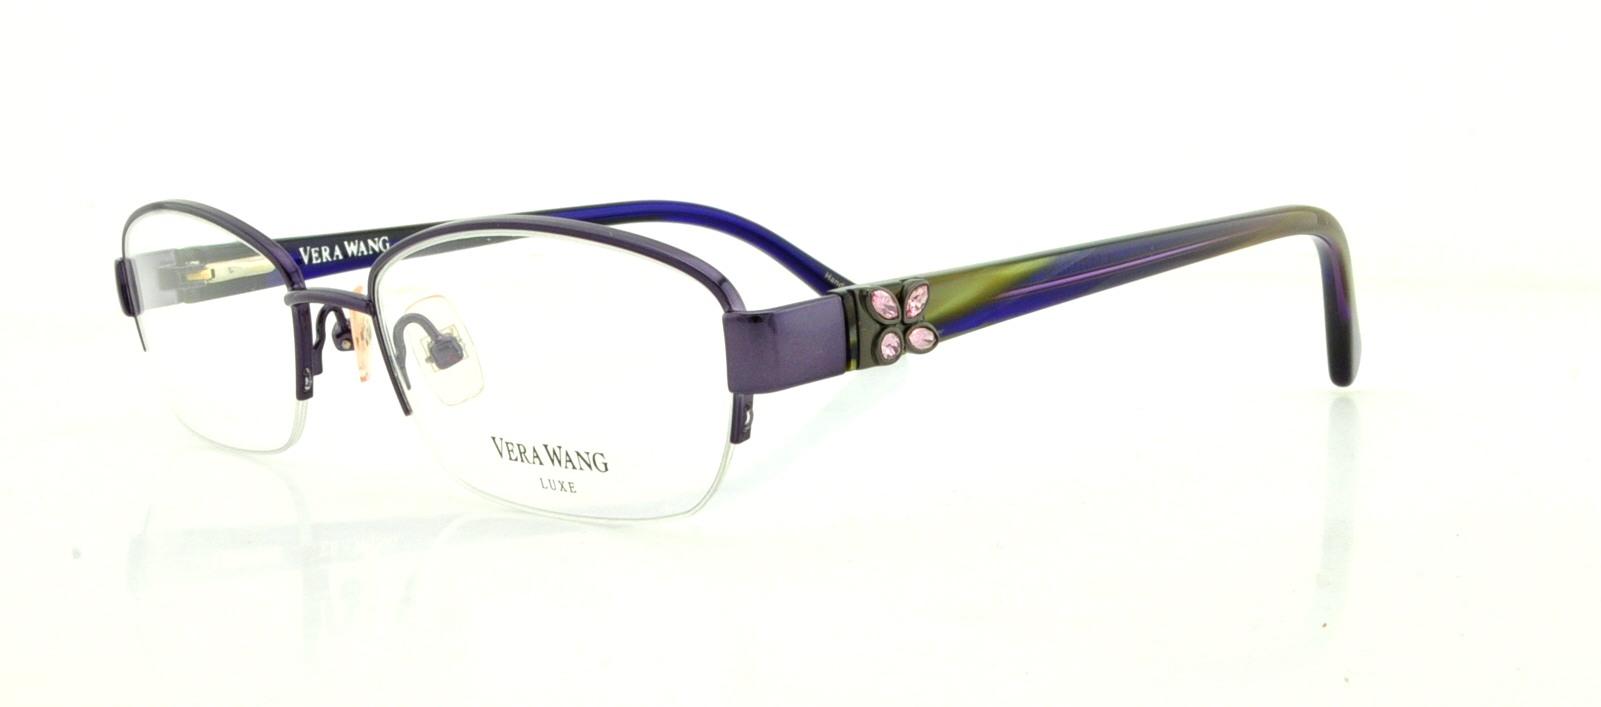 1c3a7c0dcd8a VERA WANG Eyeglasses ACACIA Amethyst 51MM 715317914062